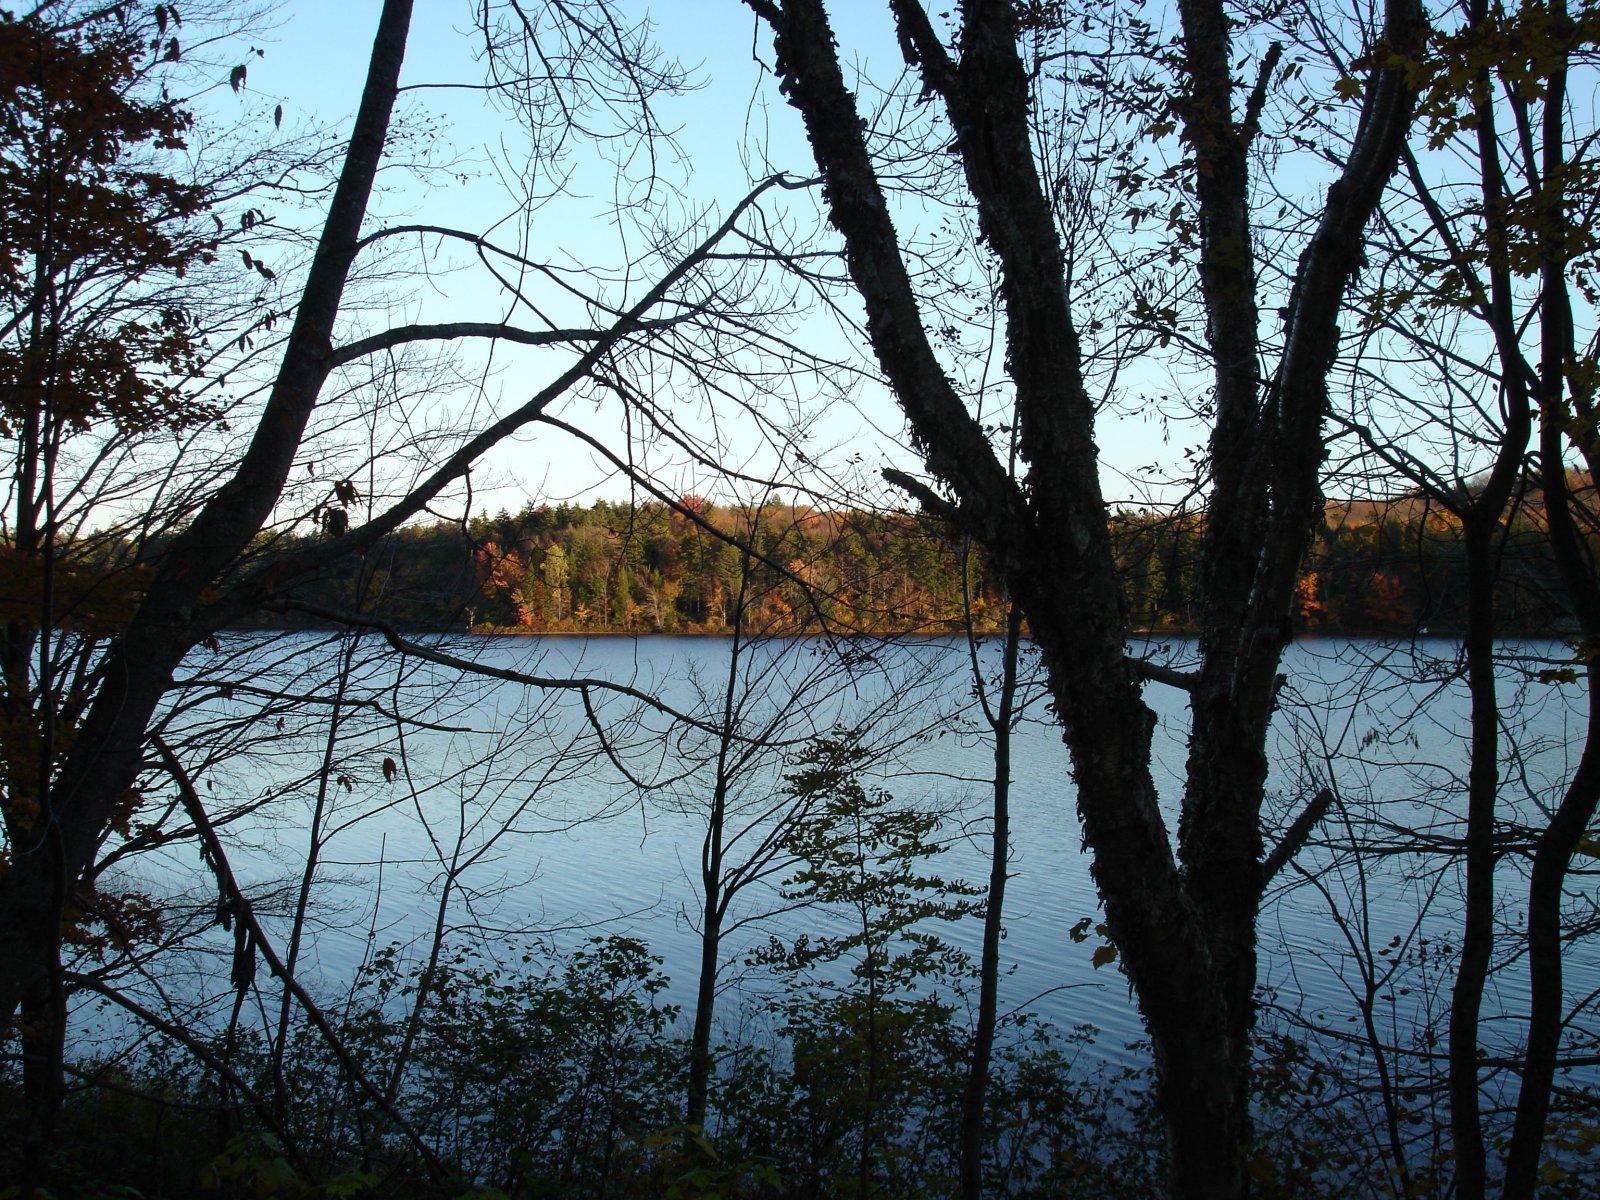 Click image for larger version  Name:Adirondack Leaf Peep'n October 2008 039.jpg Views:108 Size:637.5 KB ID:69319